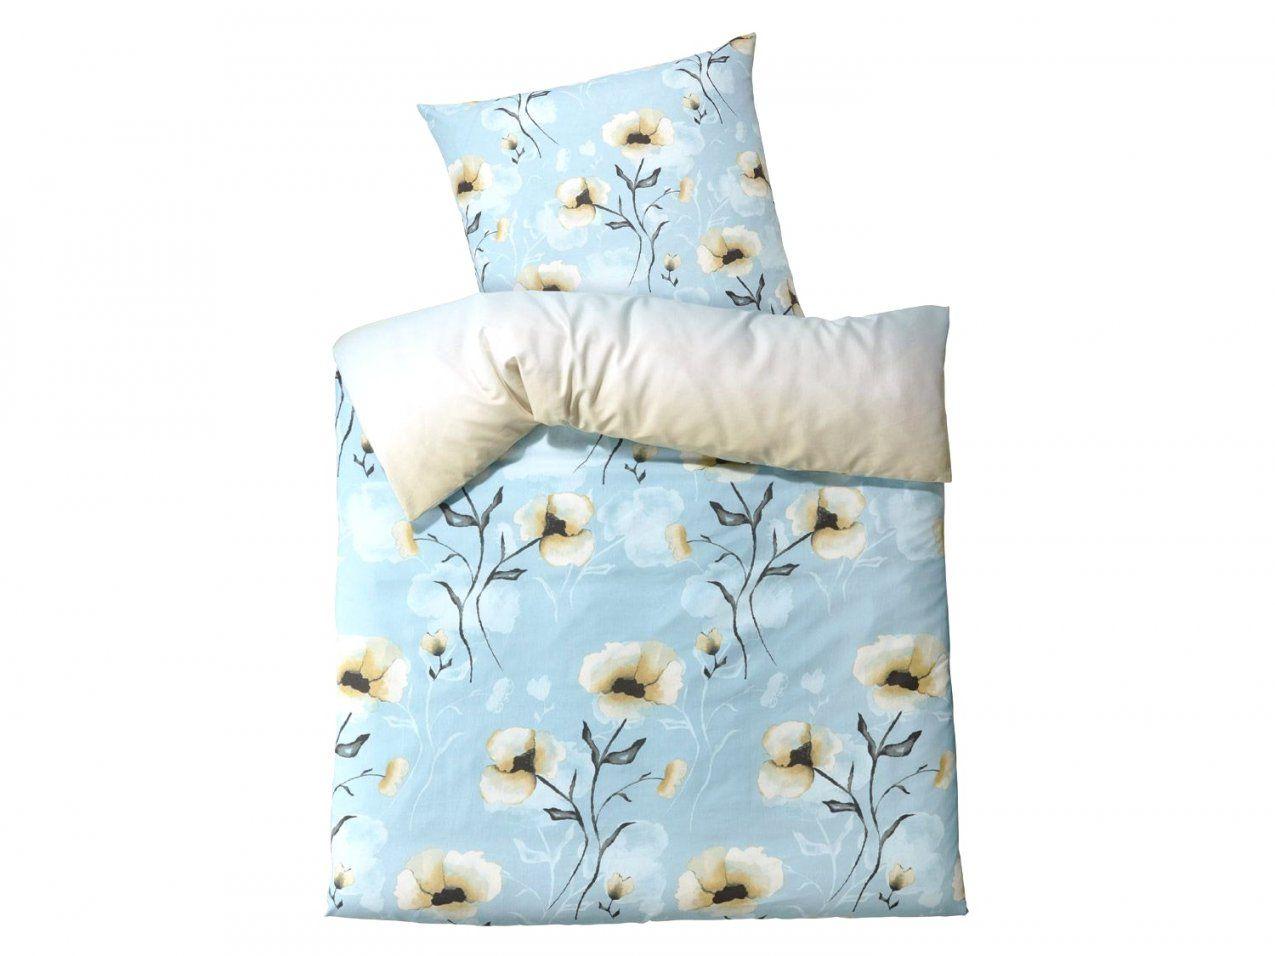 einhorn bettw sche lidl haus design ideen. Black Bedroom Furniture Sets. Home Design Ideas